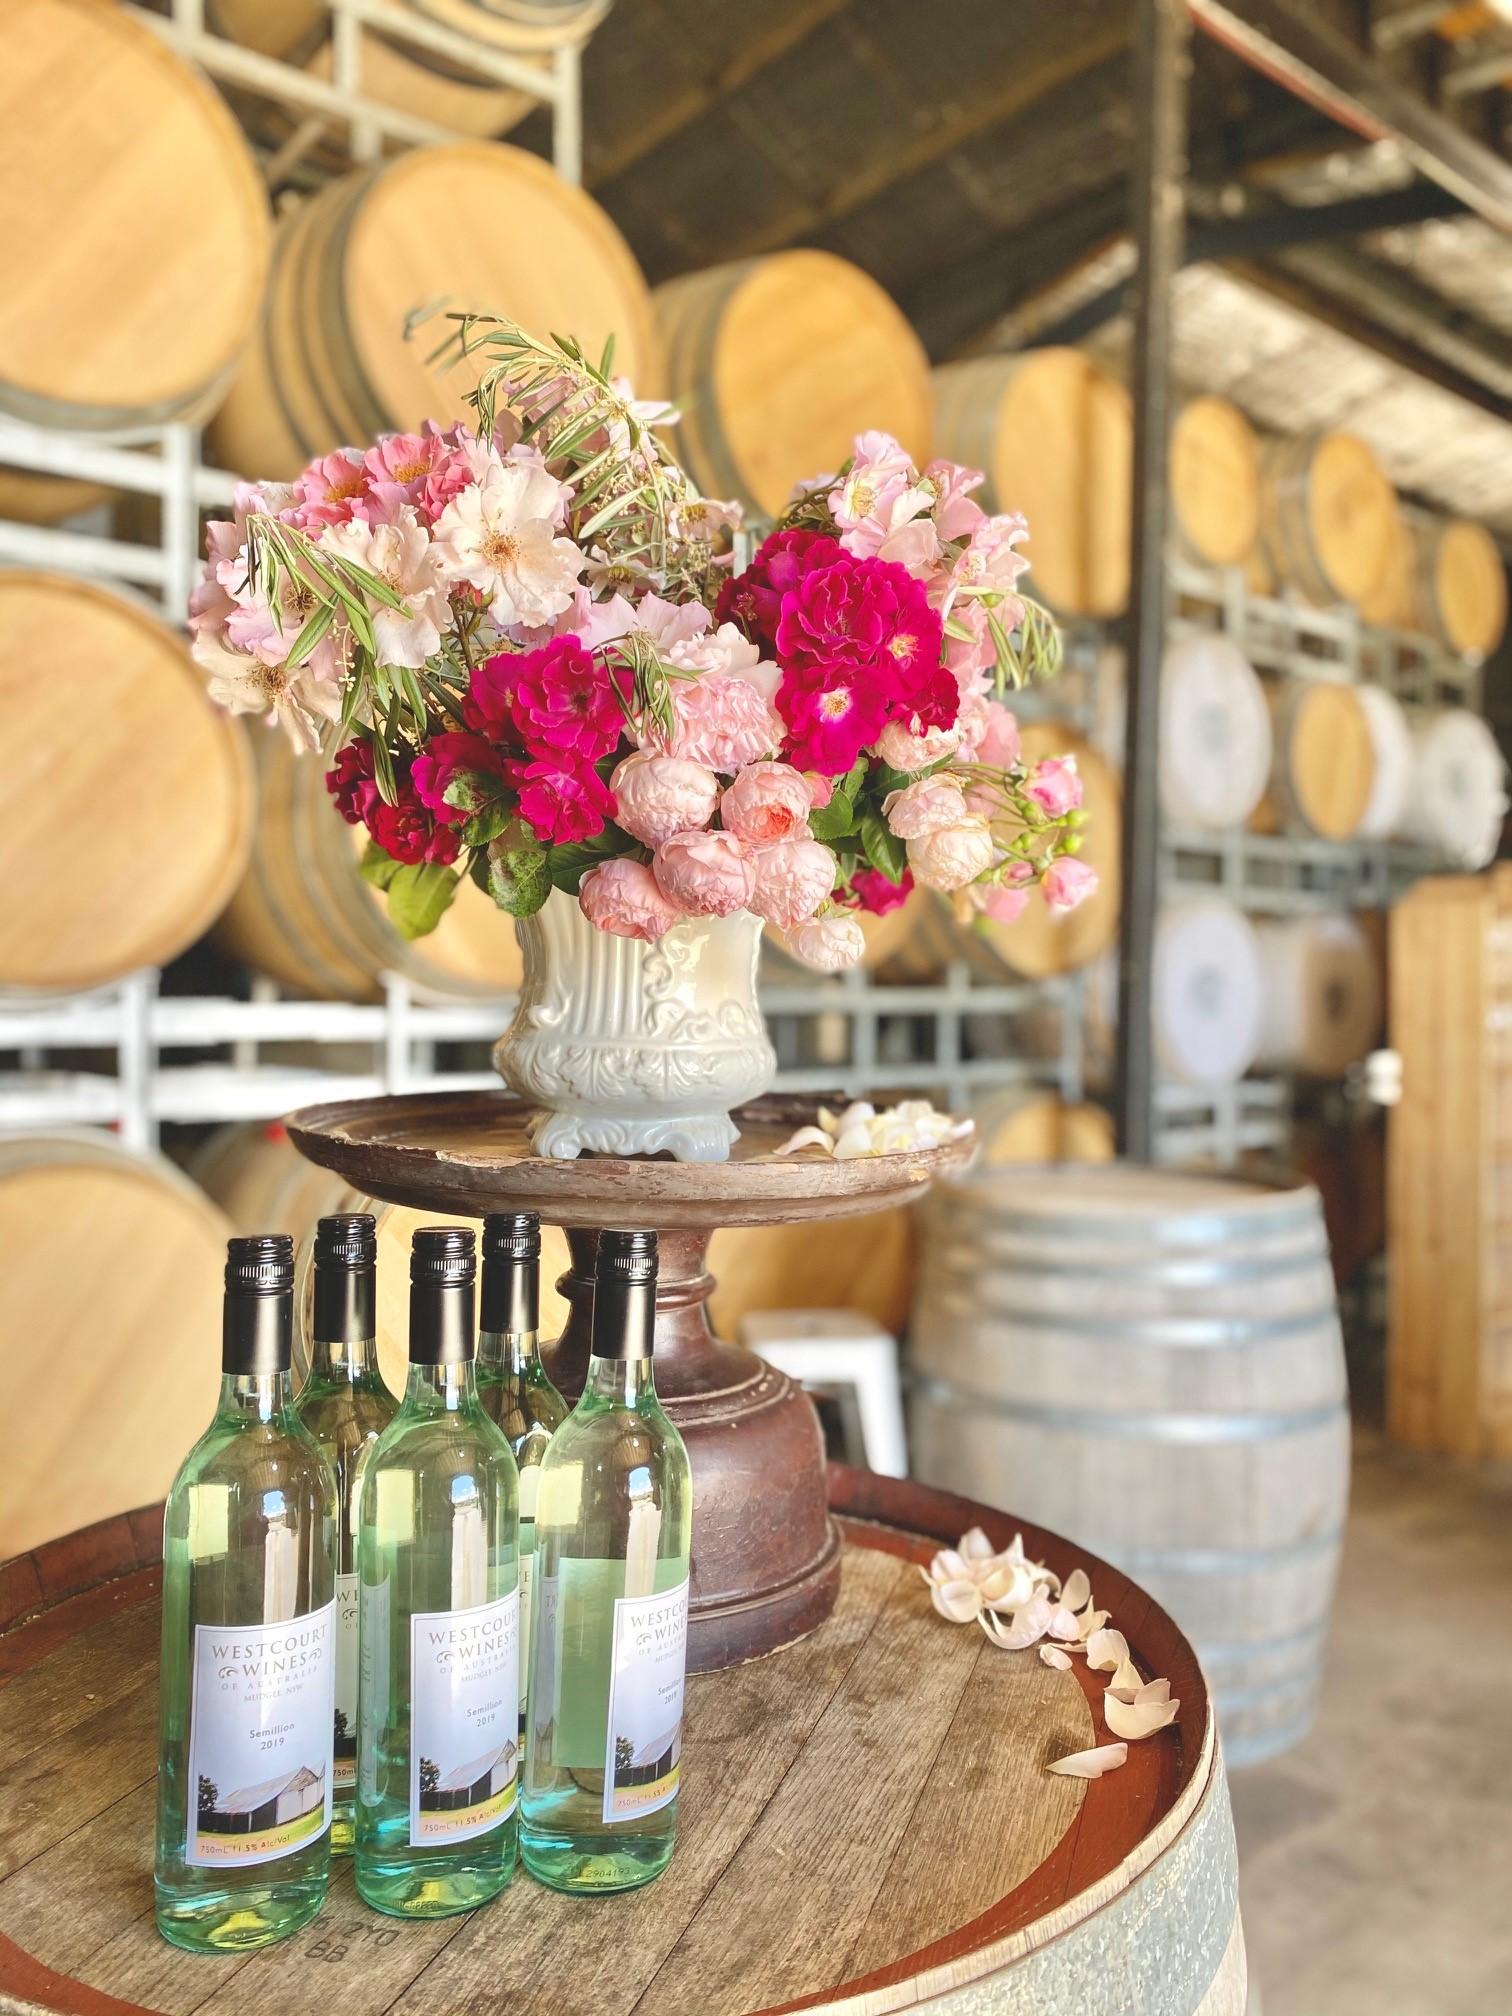 Visit The Best Wineries & Cellar Doors in Mudgee - Lowe - Giddy Guest